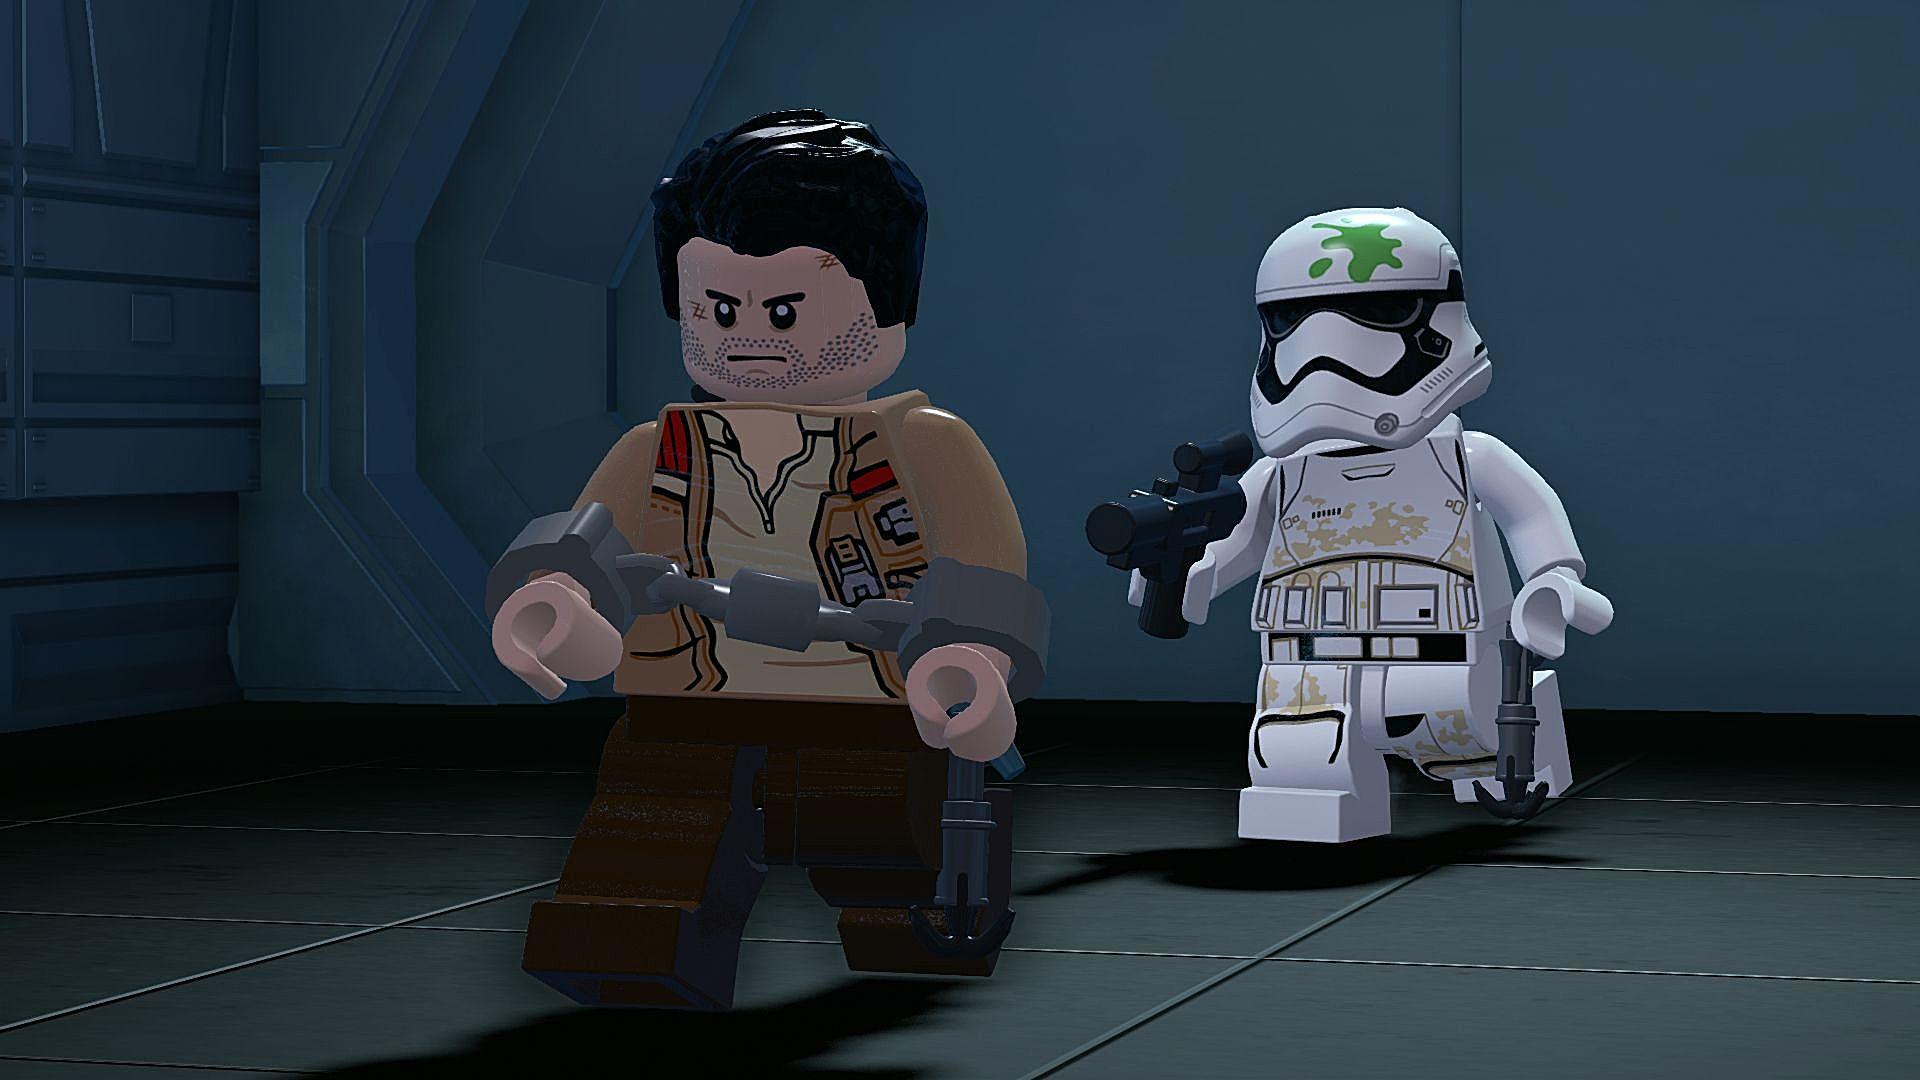 LEGO Star Wars: The Skywalker Saga Wallpapers